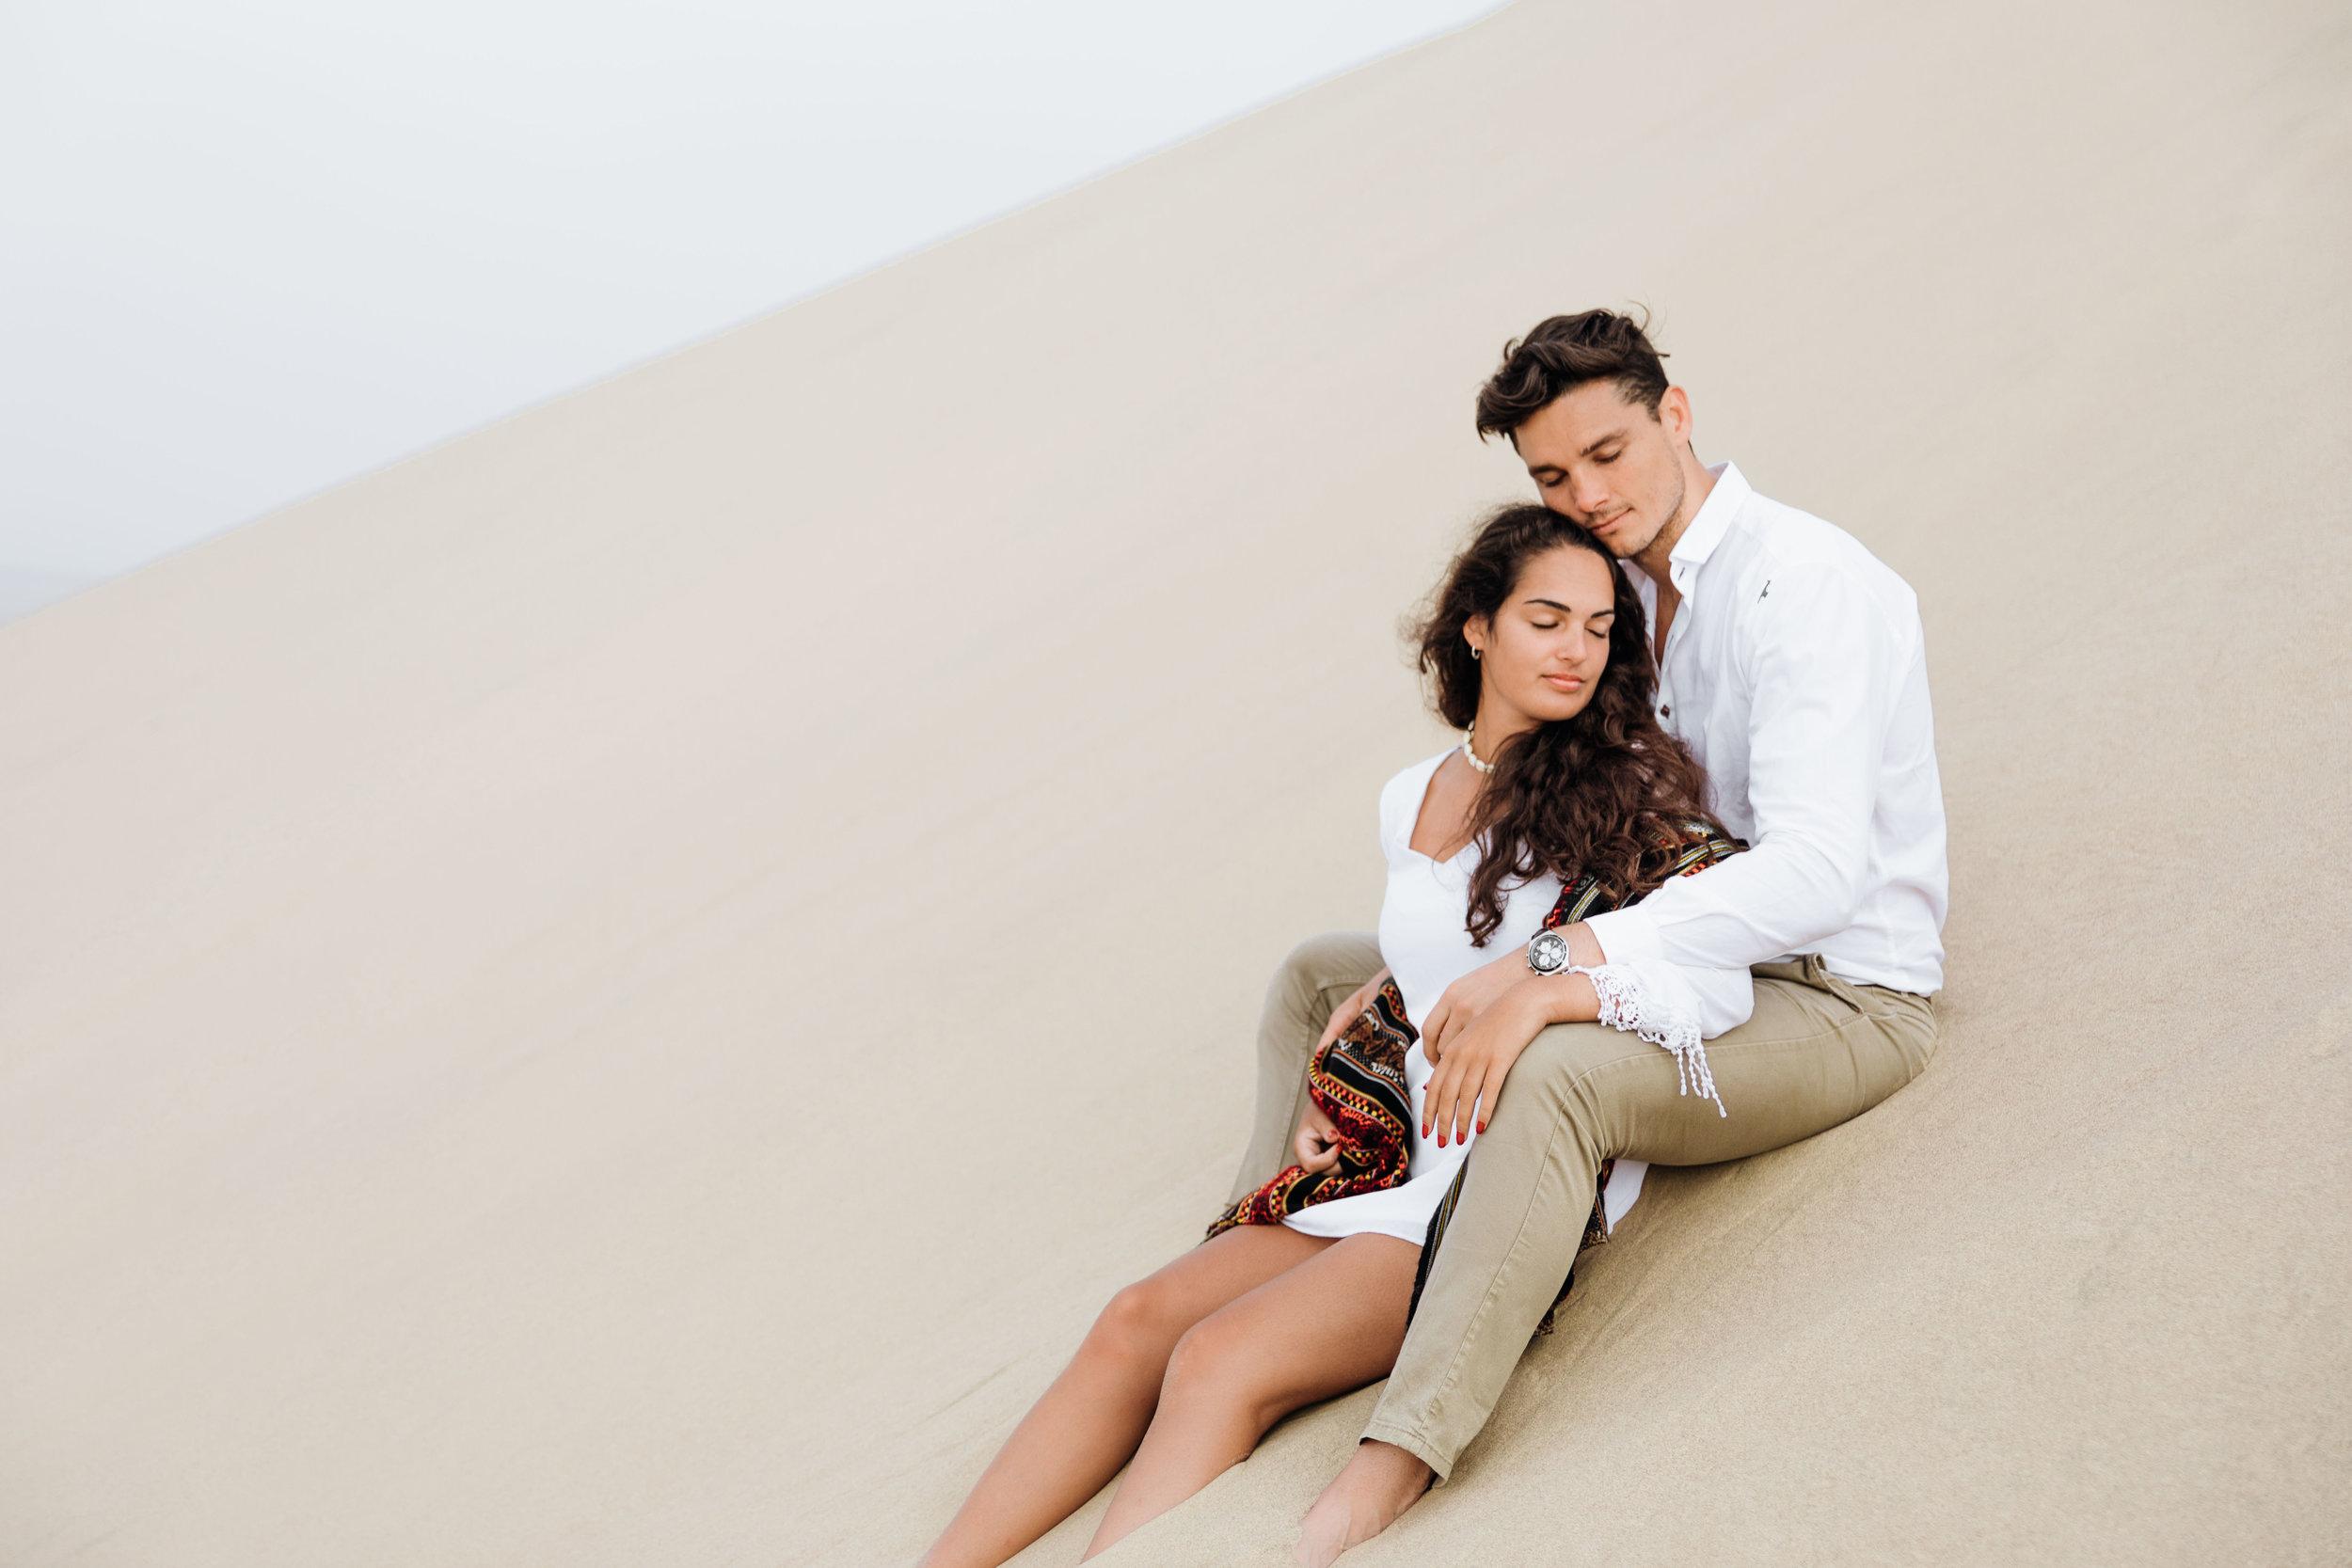 huacachina-peru-honeymoon-elopement-destination-wedding-photography-michael-cozzens-39.jpg